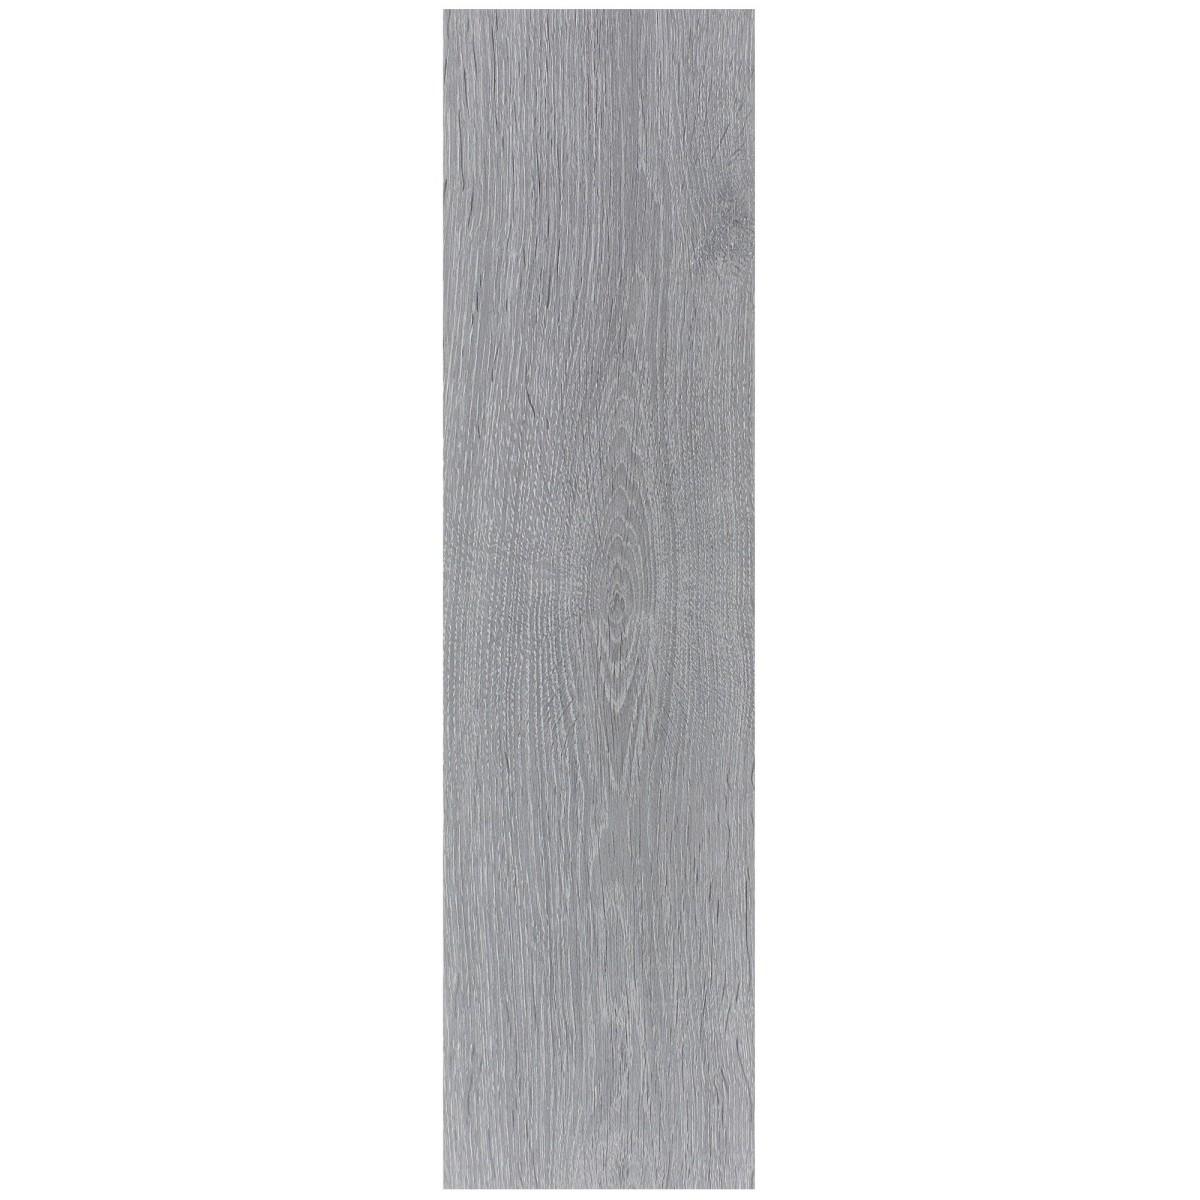 Боковины для экрана универсальные цвет серый дуб